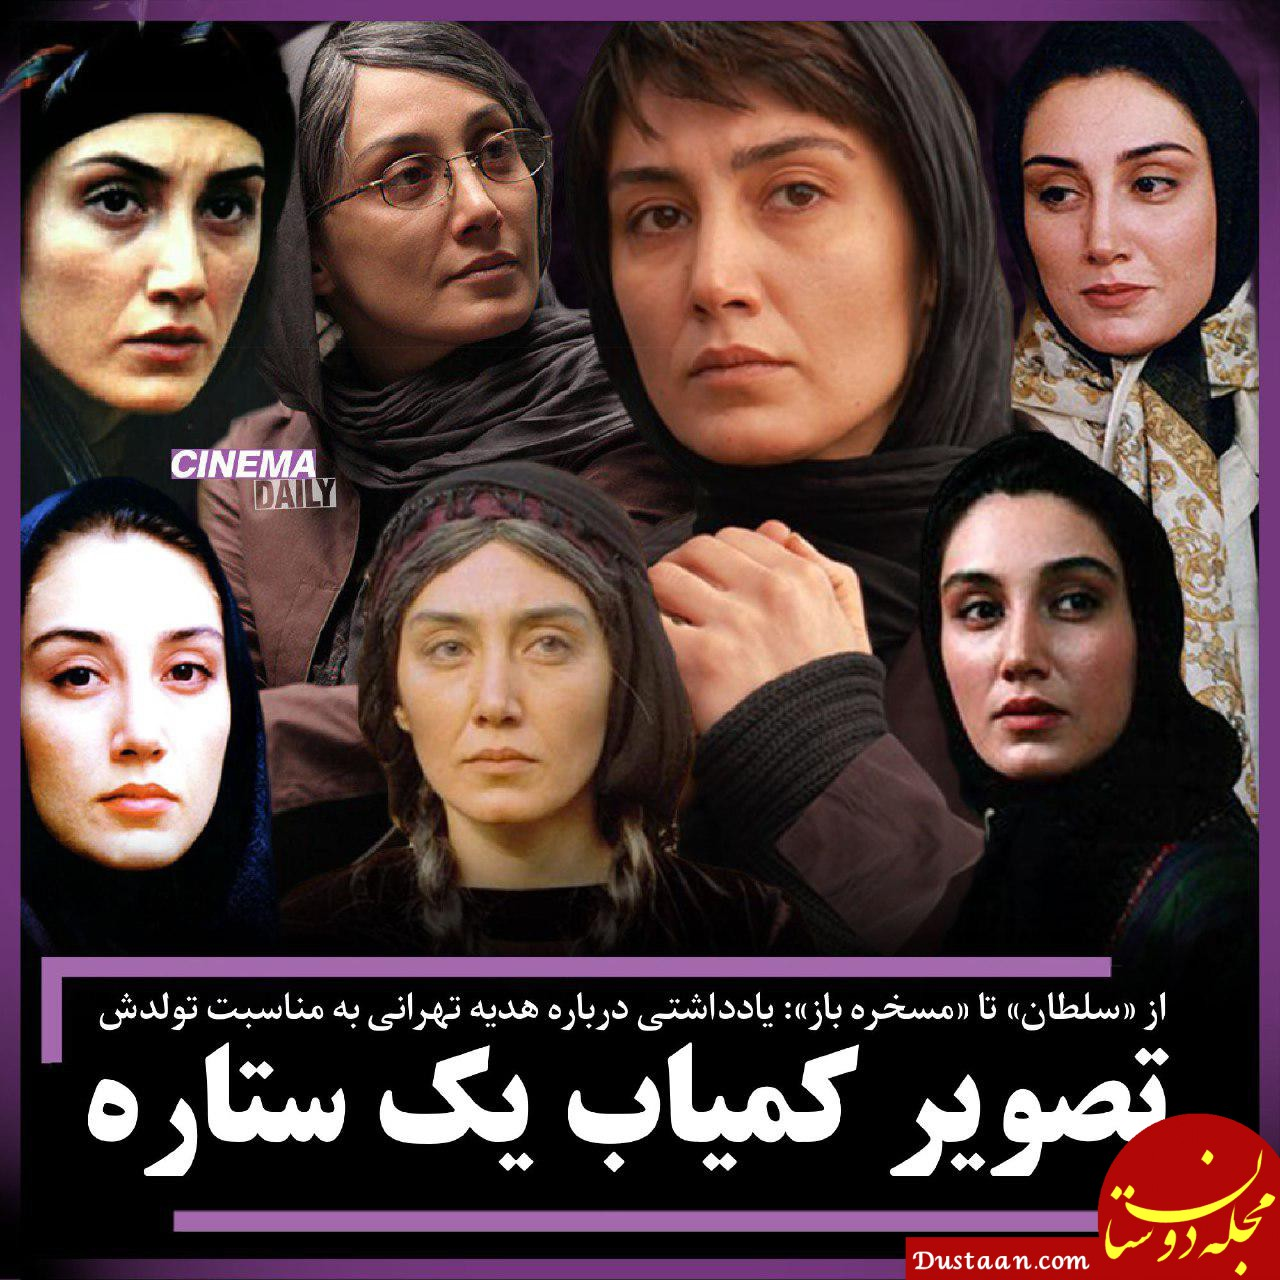 www.dustaan.com هدیه تهرانی چگونه ستاره شد و ستاره ماند!